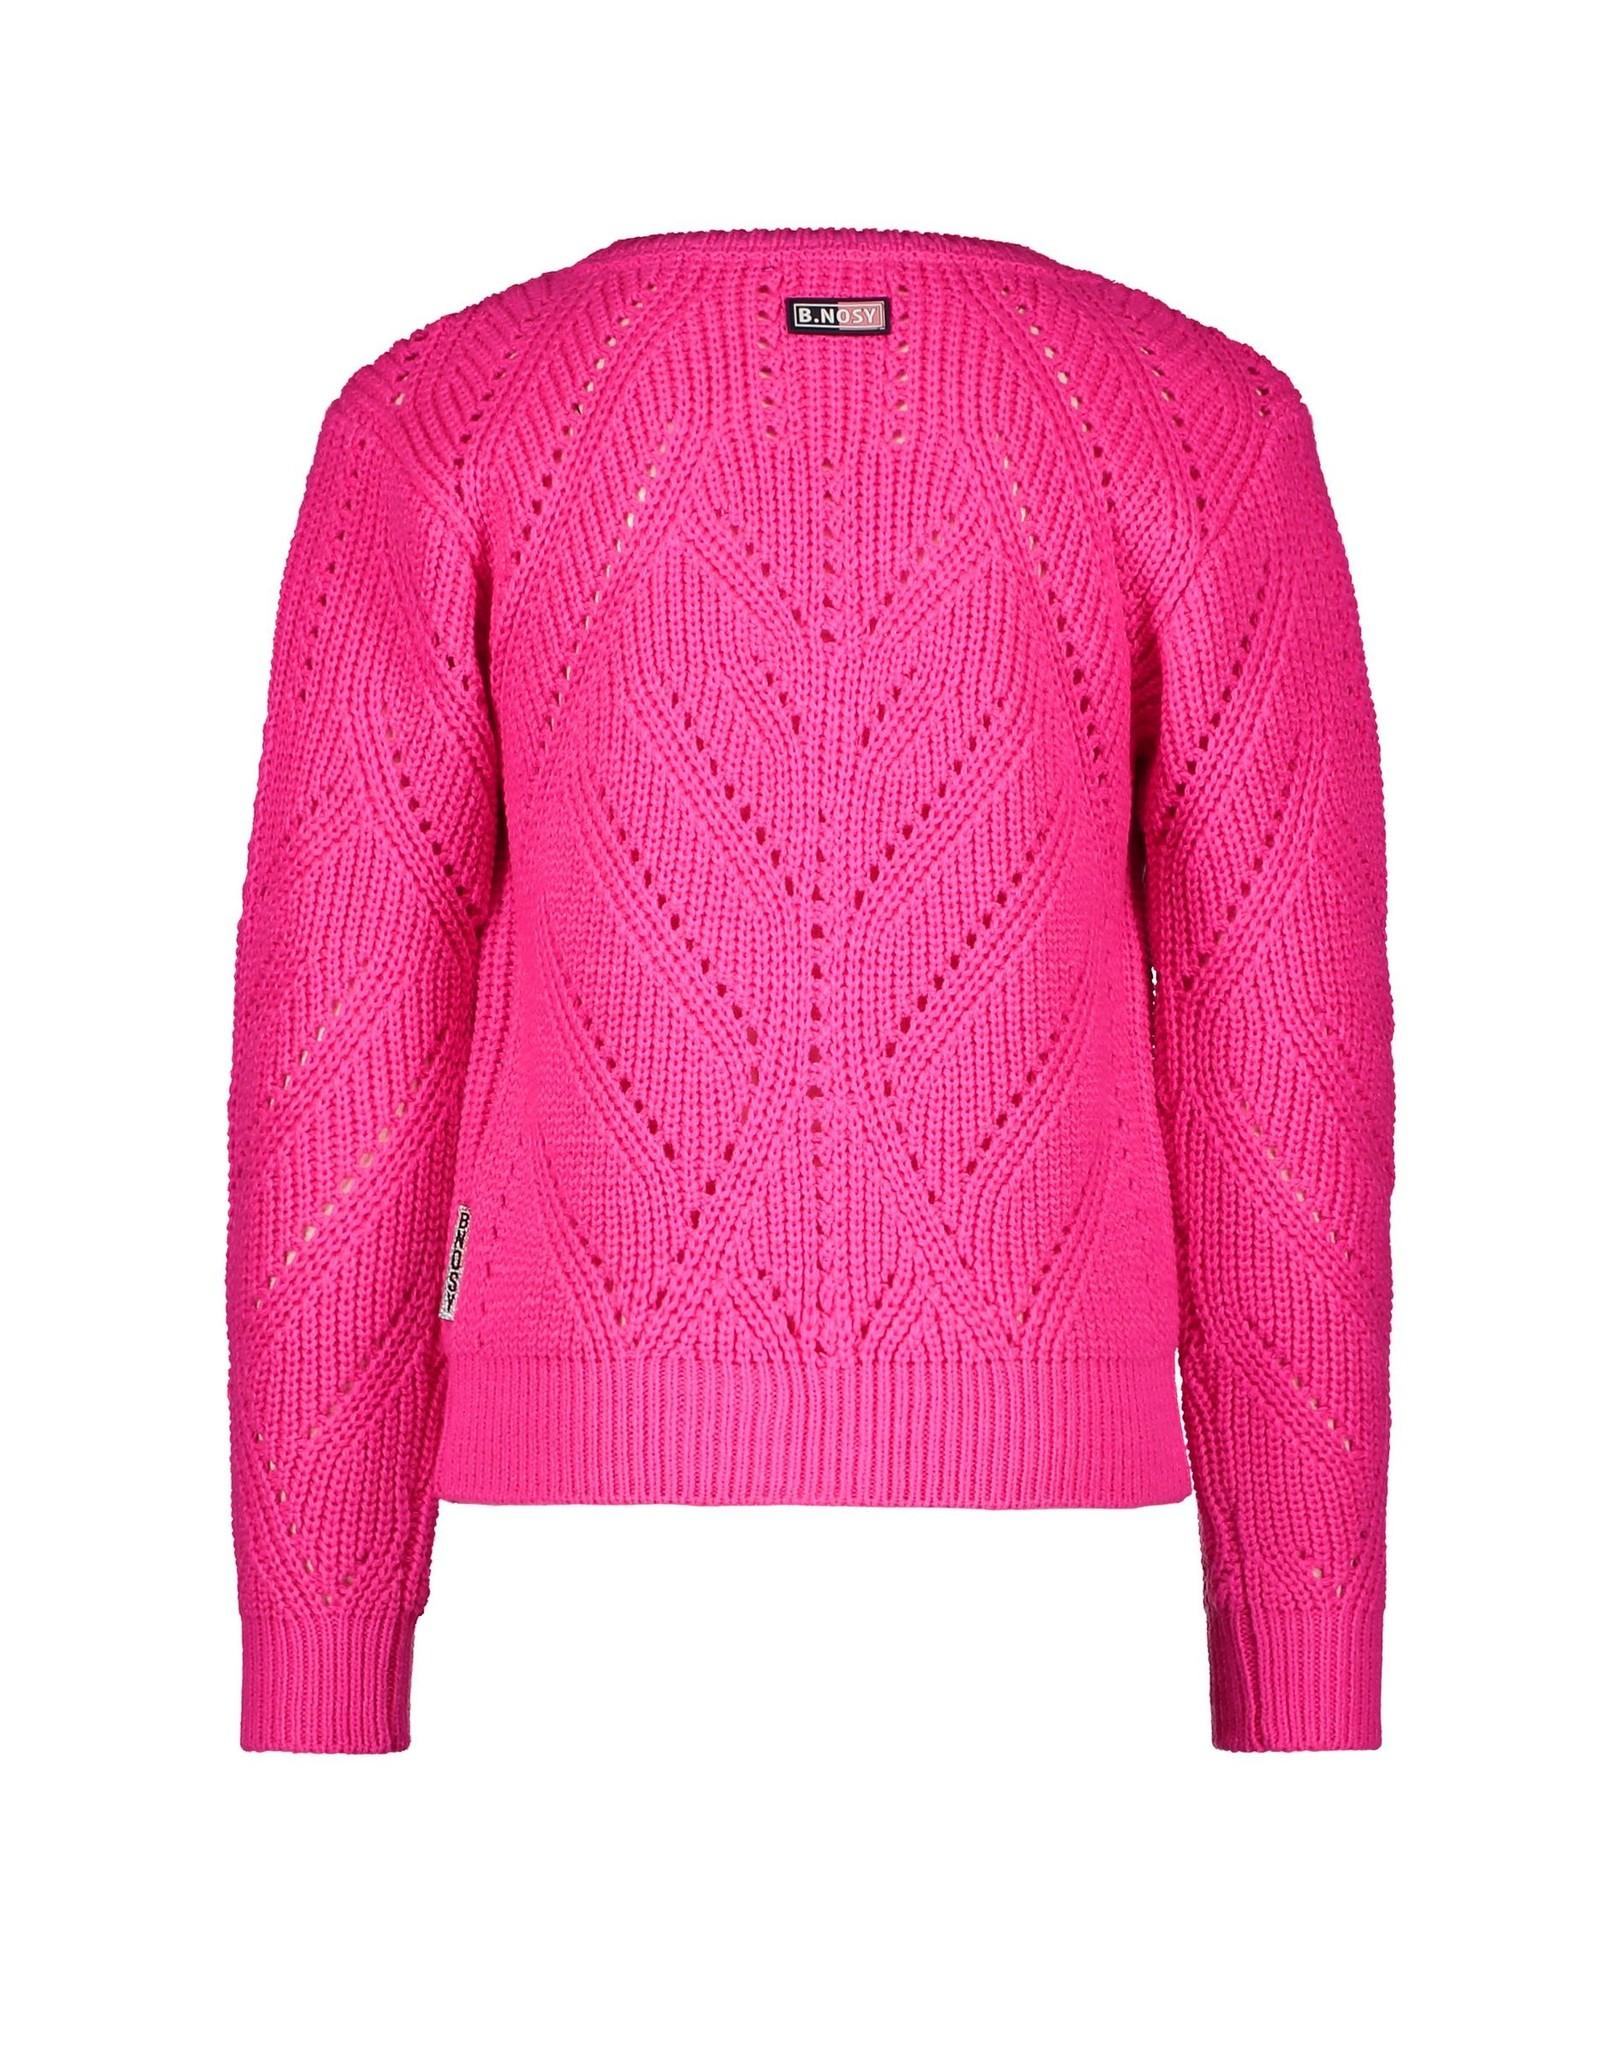 B.Nosy B.Nosy Girls Heavy Knit Cardigan Pink Glo